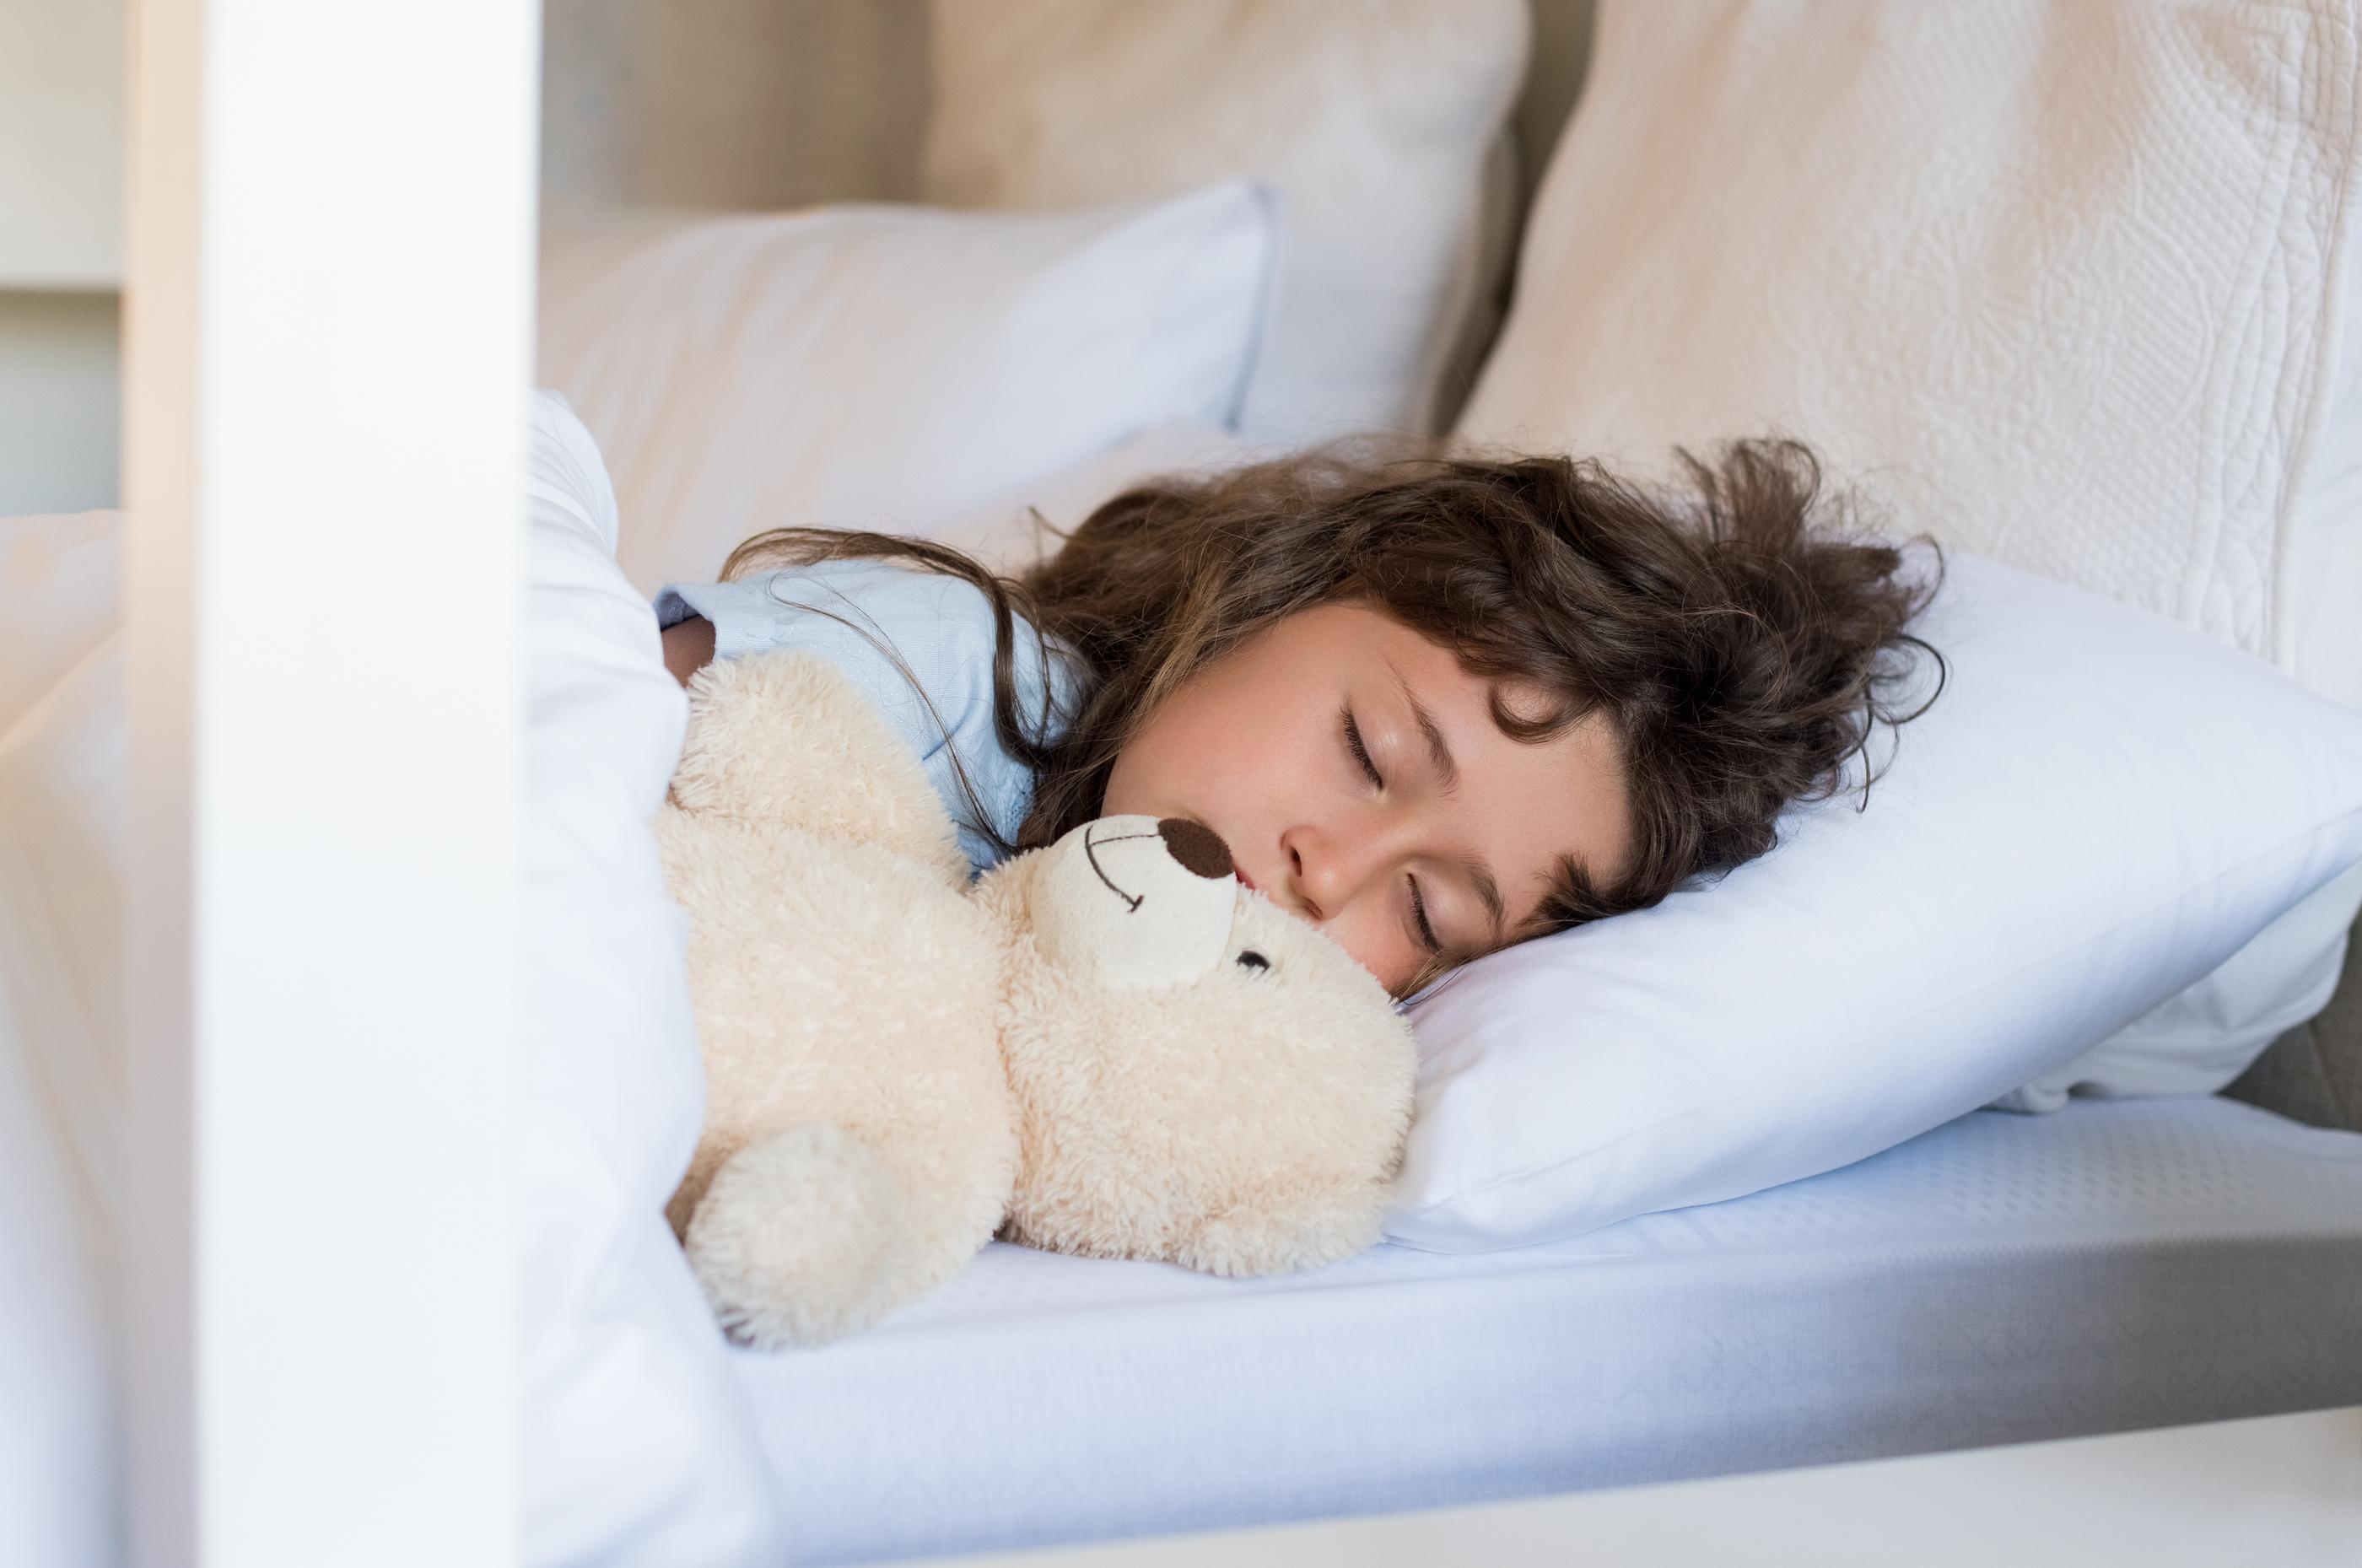 Sweet child sleeping in bed. Little girl sleeping with teddy bear at morning. Cute little girl sleep